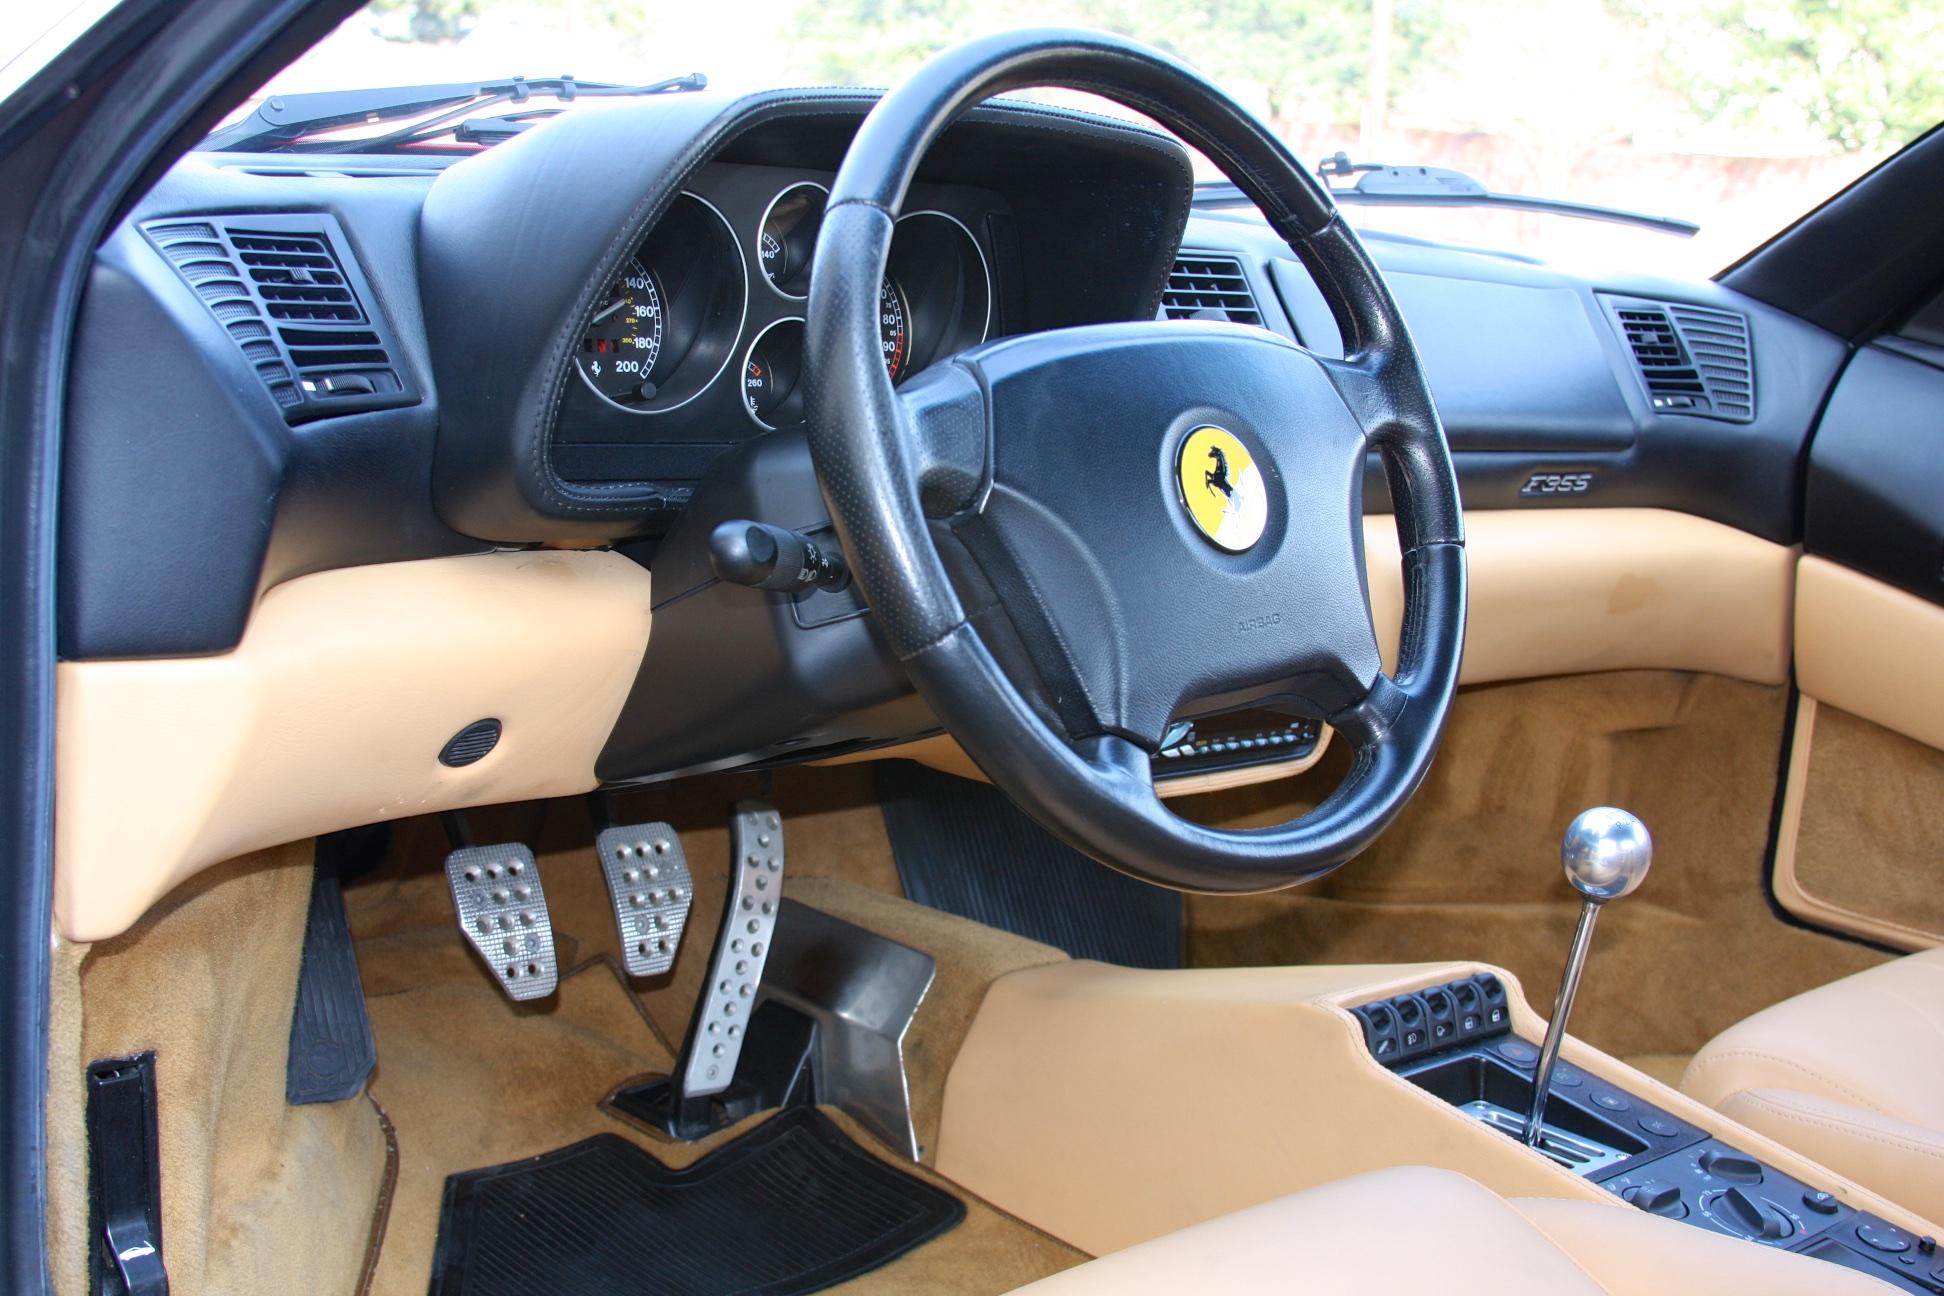 1996 Ferrari F355 Spider (T0105008) - 18.jpg